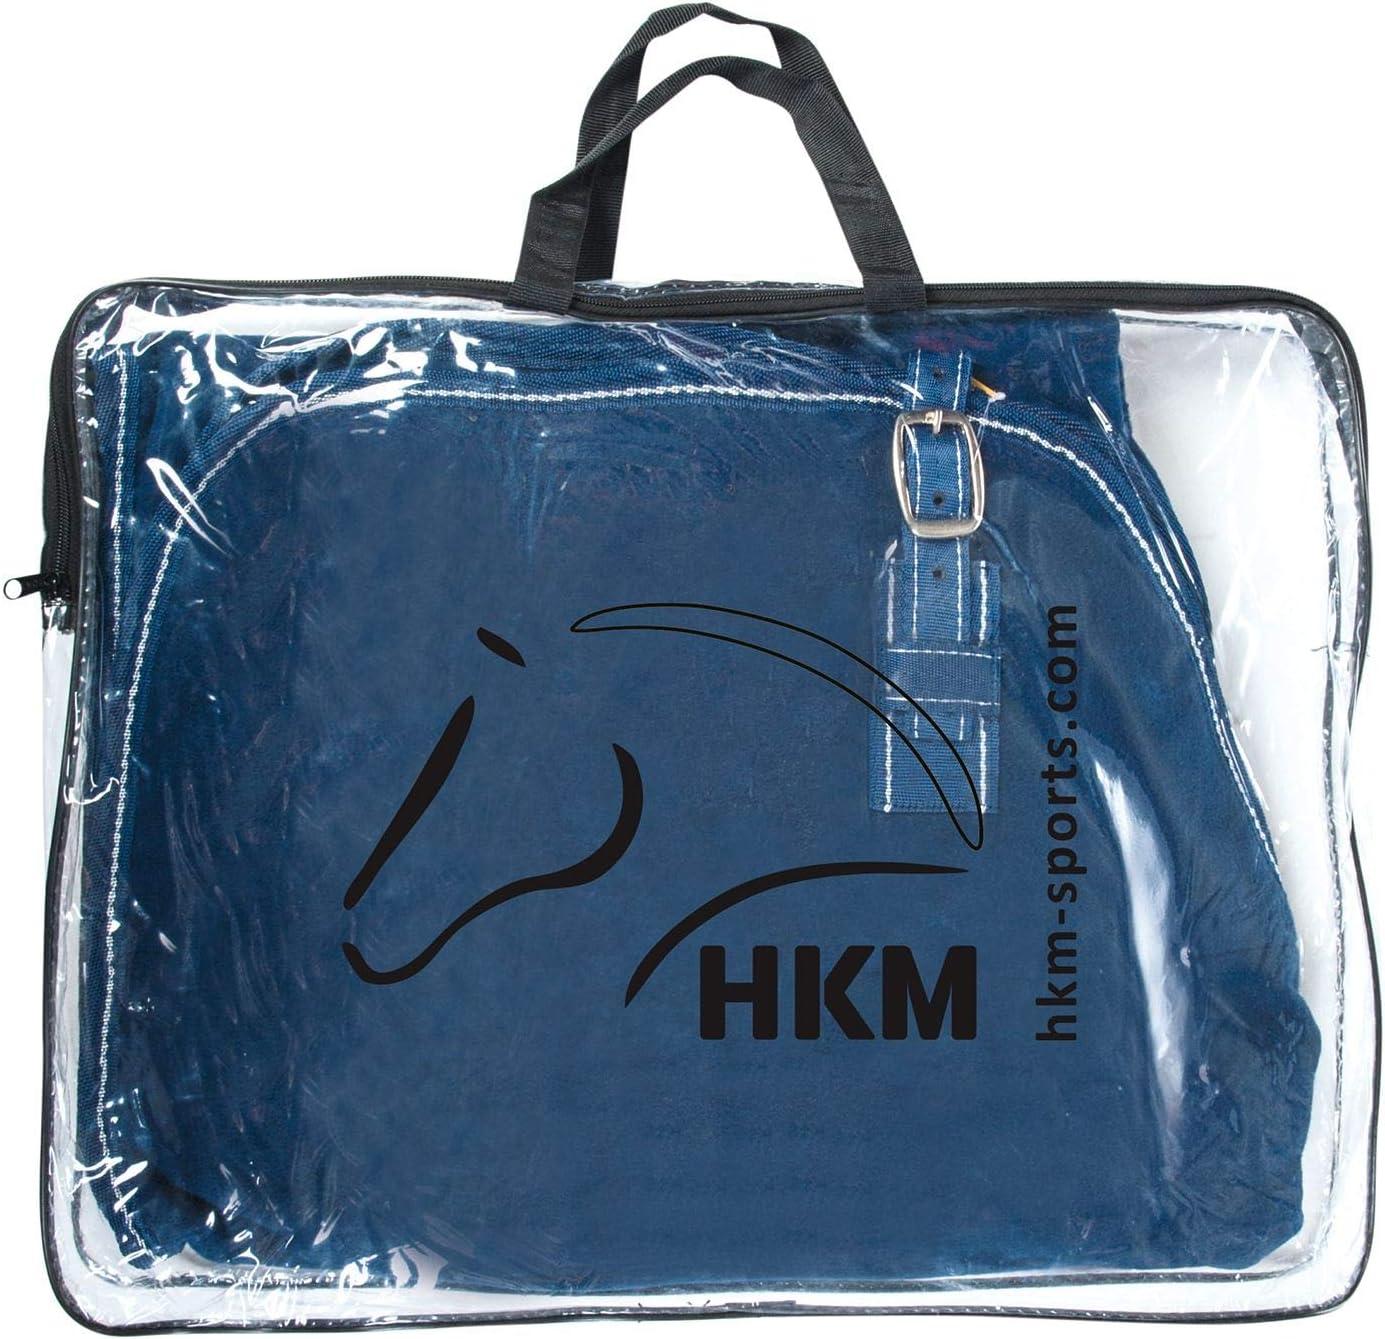 Forro Polar, 115-165 Manta para Caballo HKM 8775 Madrid